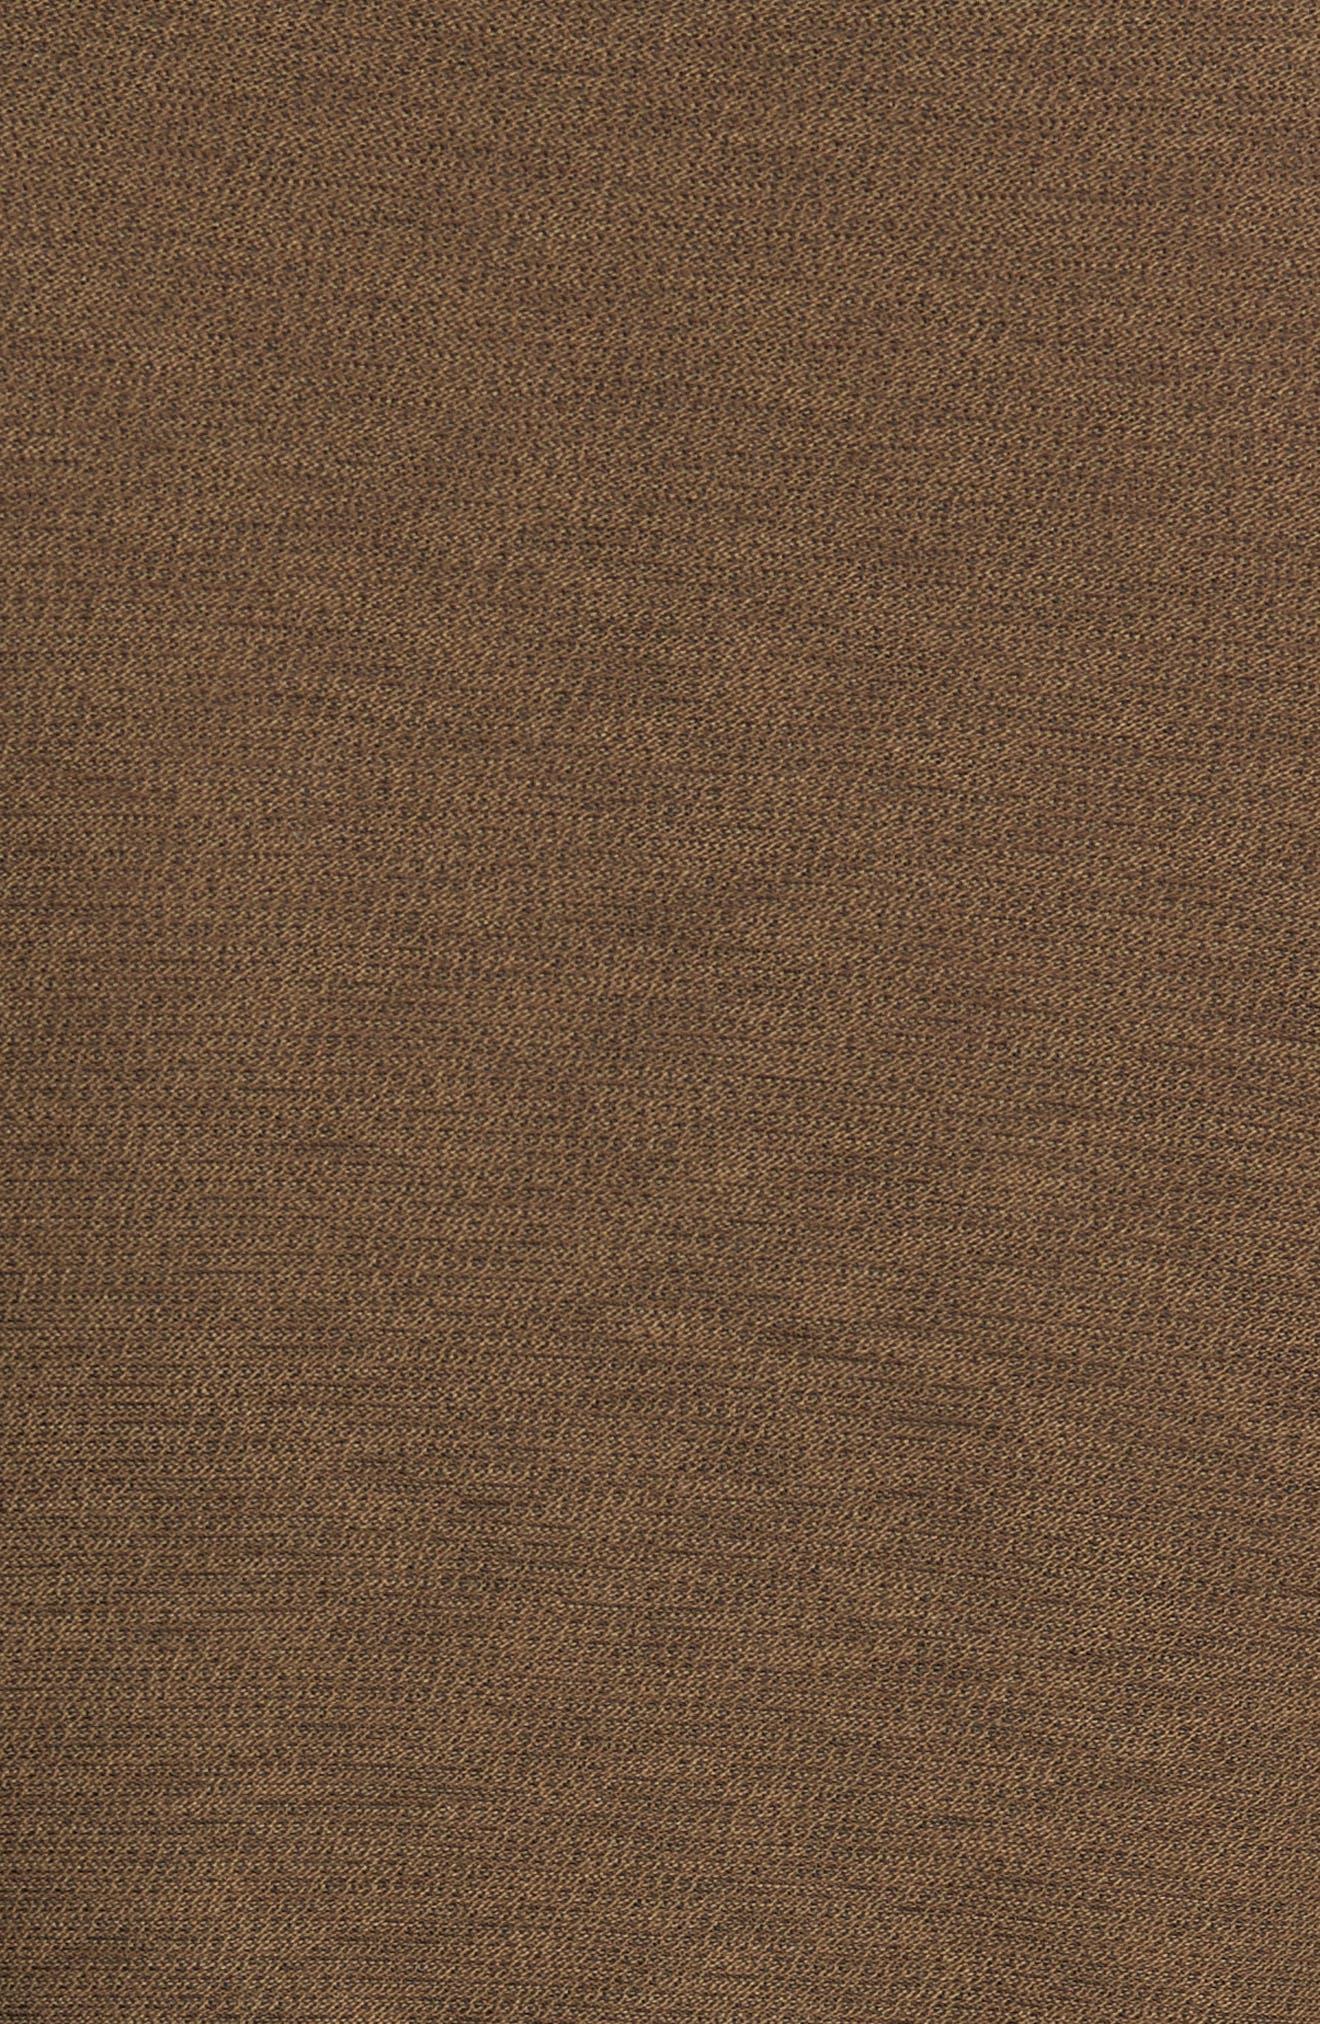 Regular Fit Long Sleeve T-Shirt,                             Alternate thumbnail 5, color,                             OLIVE